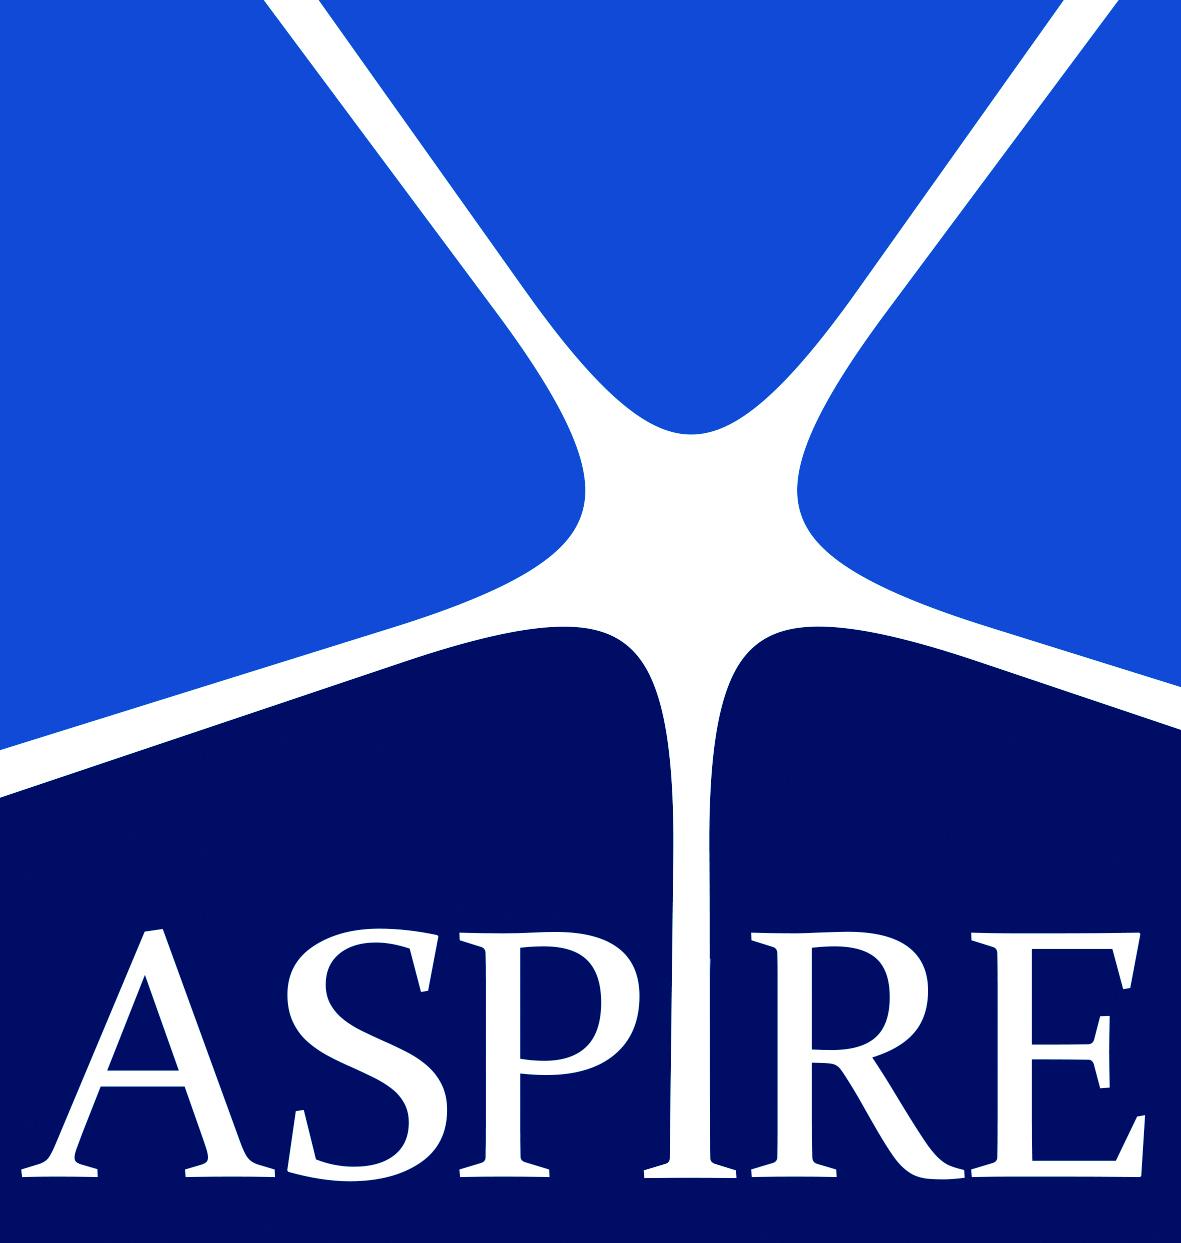 ASPIRE Forum 2018 Student Workshop @南洋理工大学/シンガポール  参加者募集